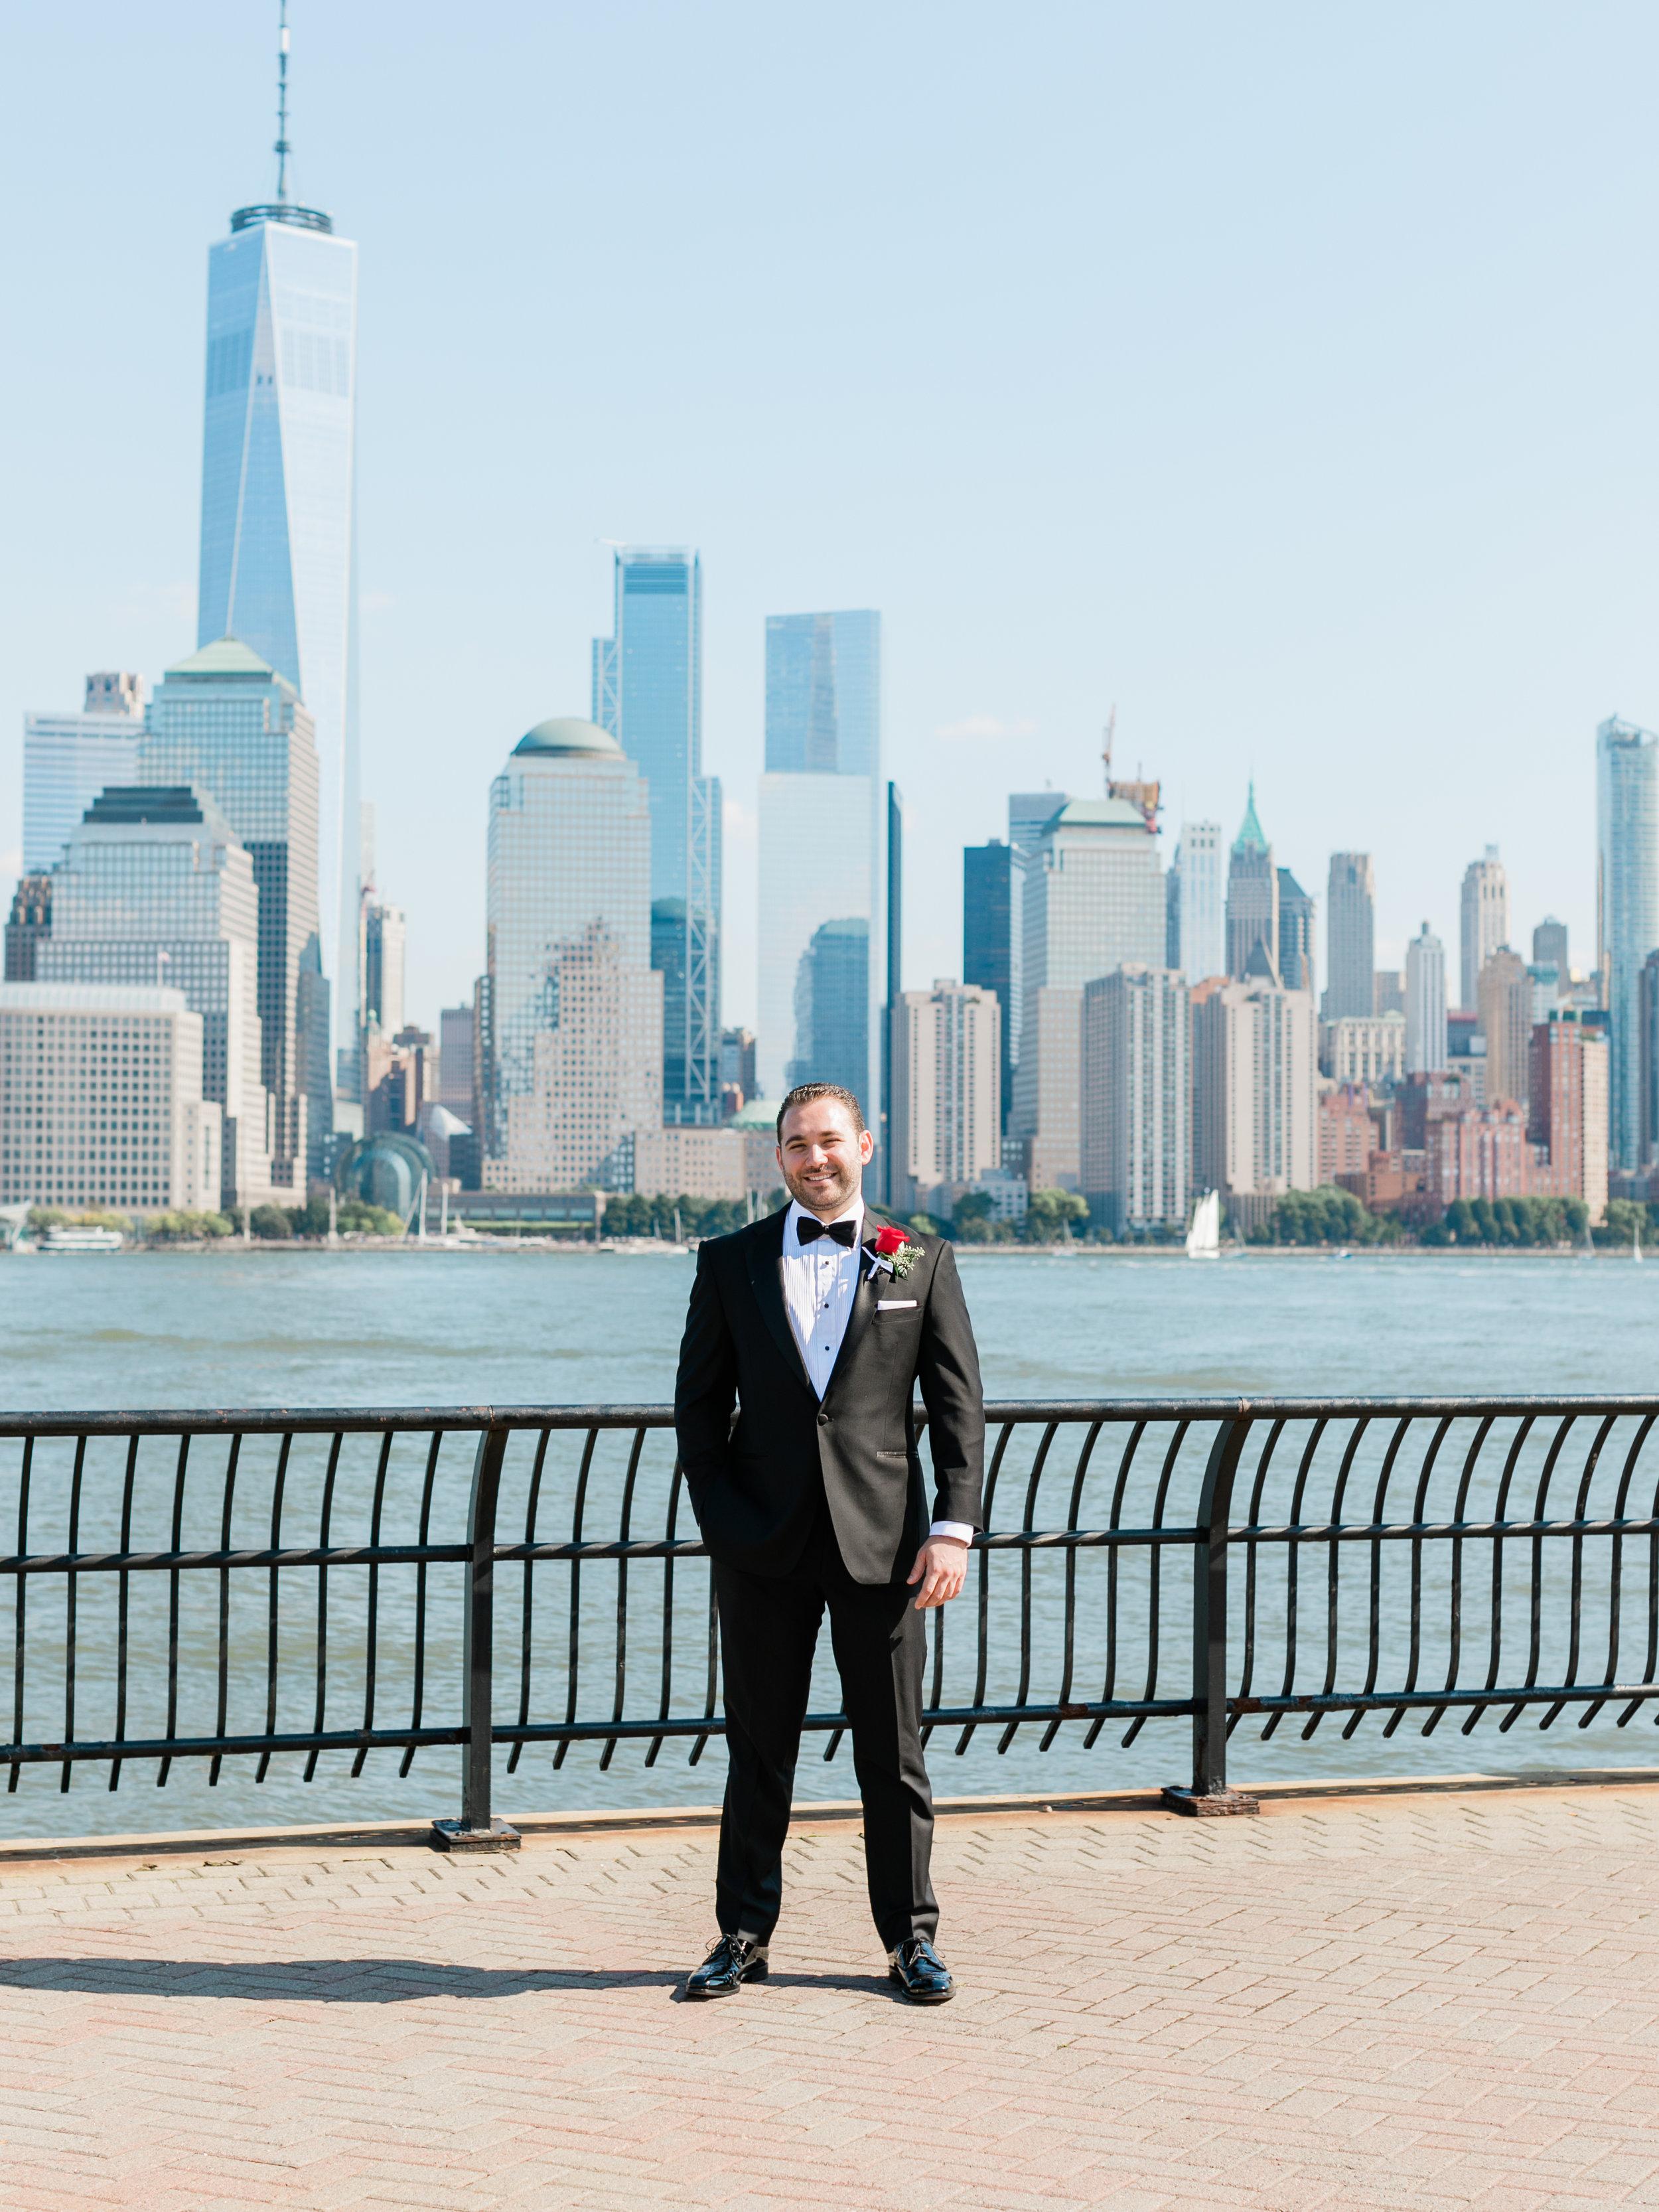 hyatt-regency-jersey-city-wedding-photographer17.jpg